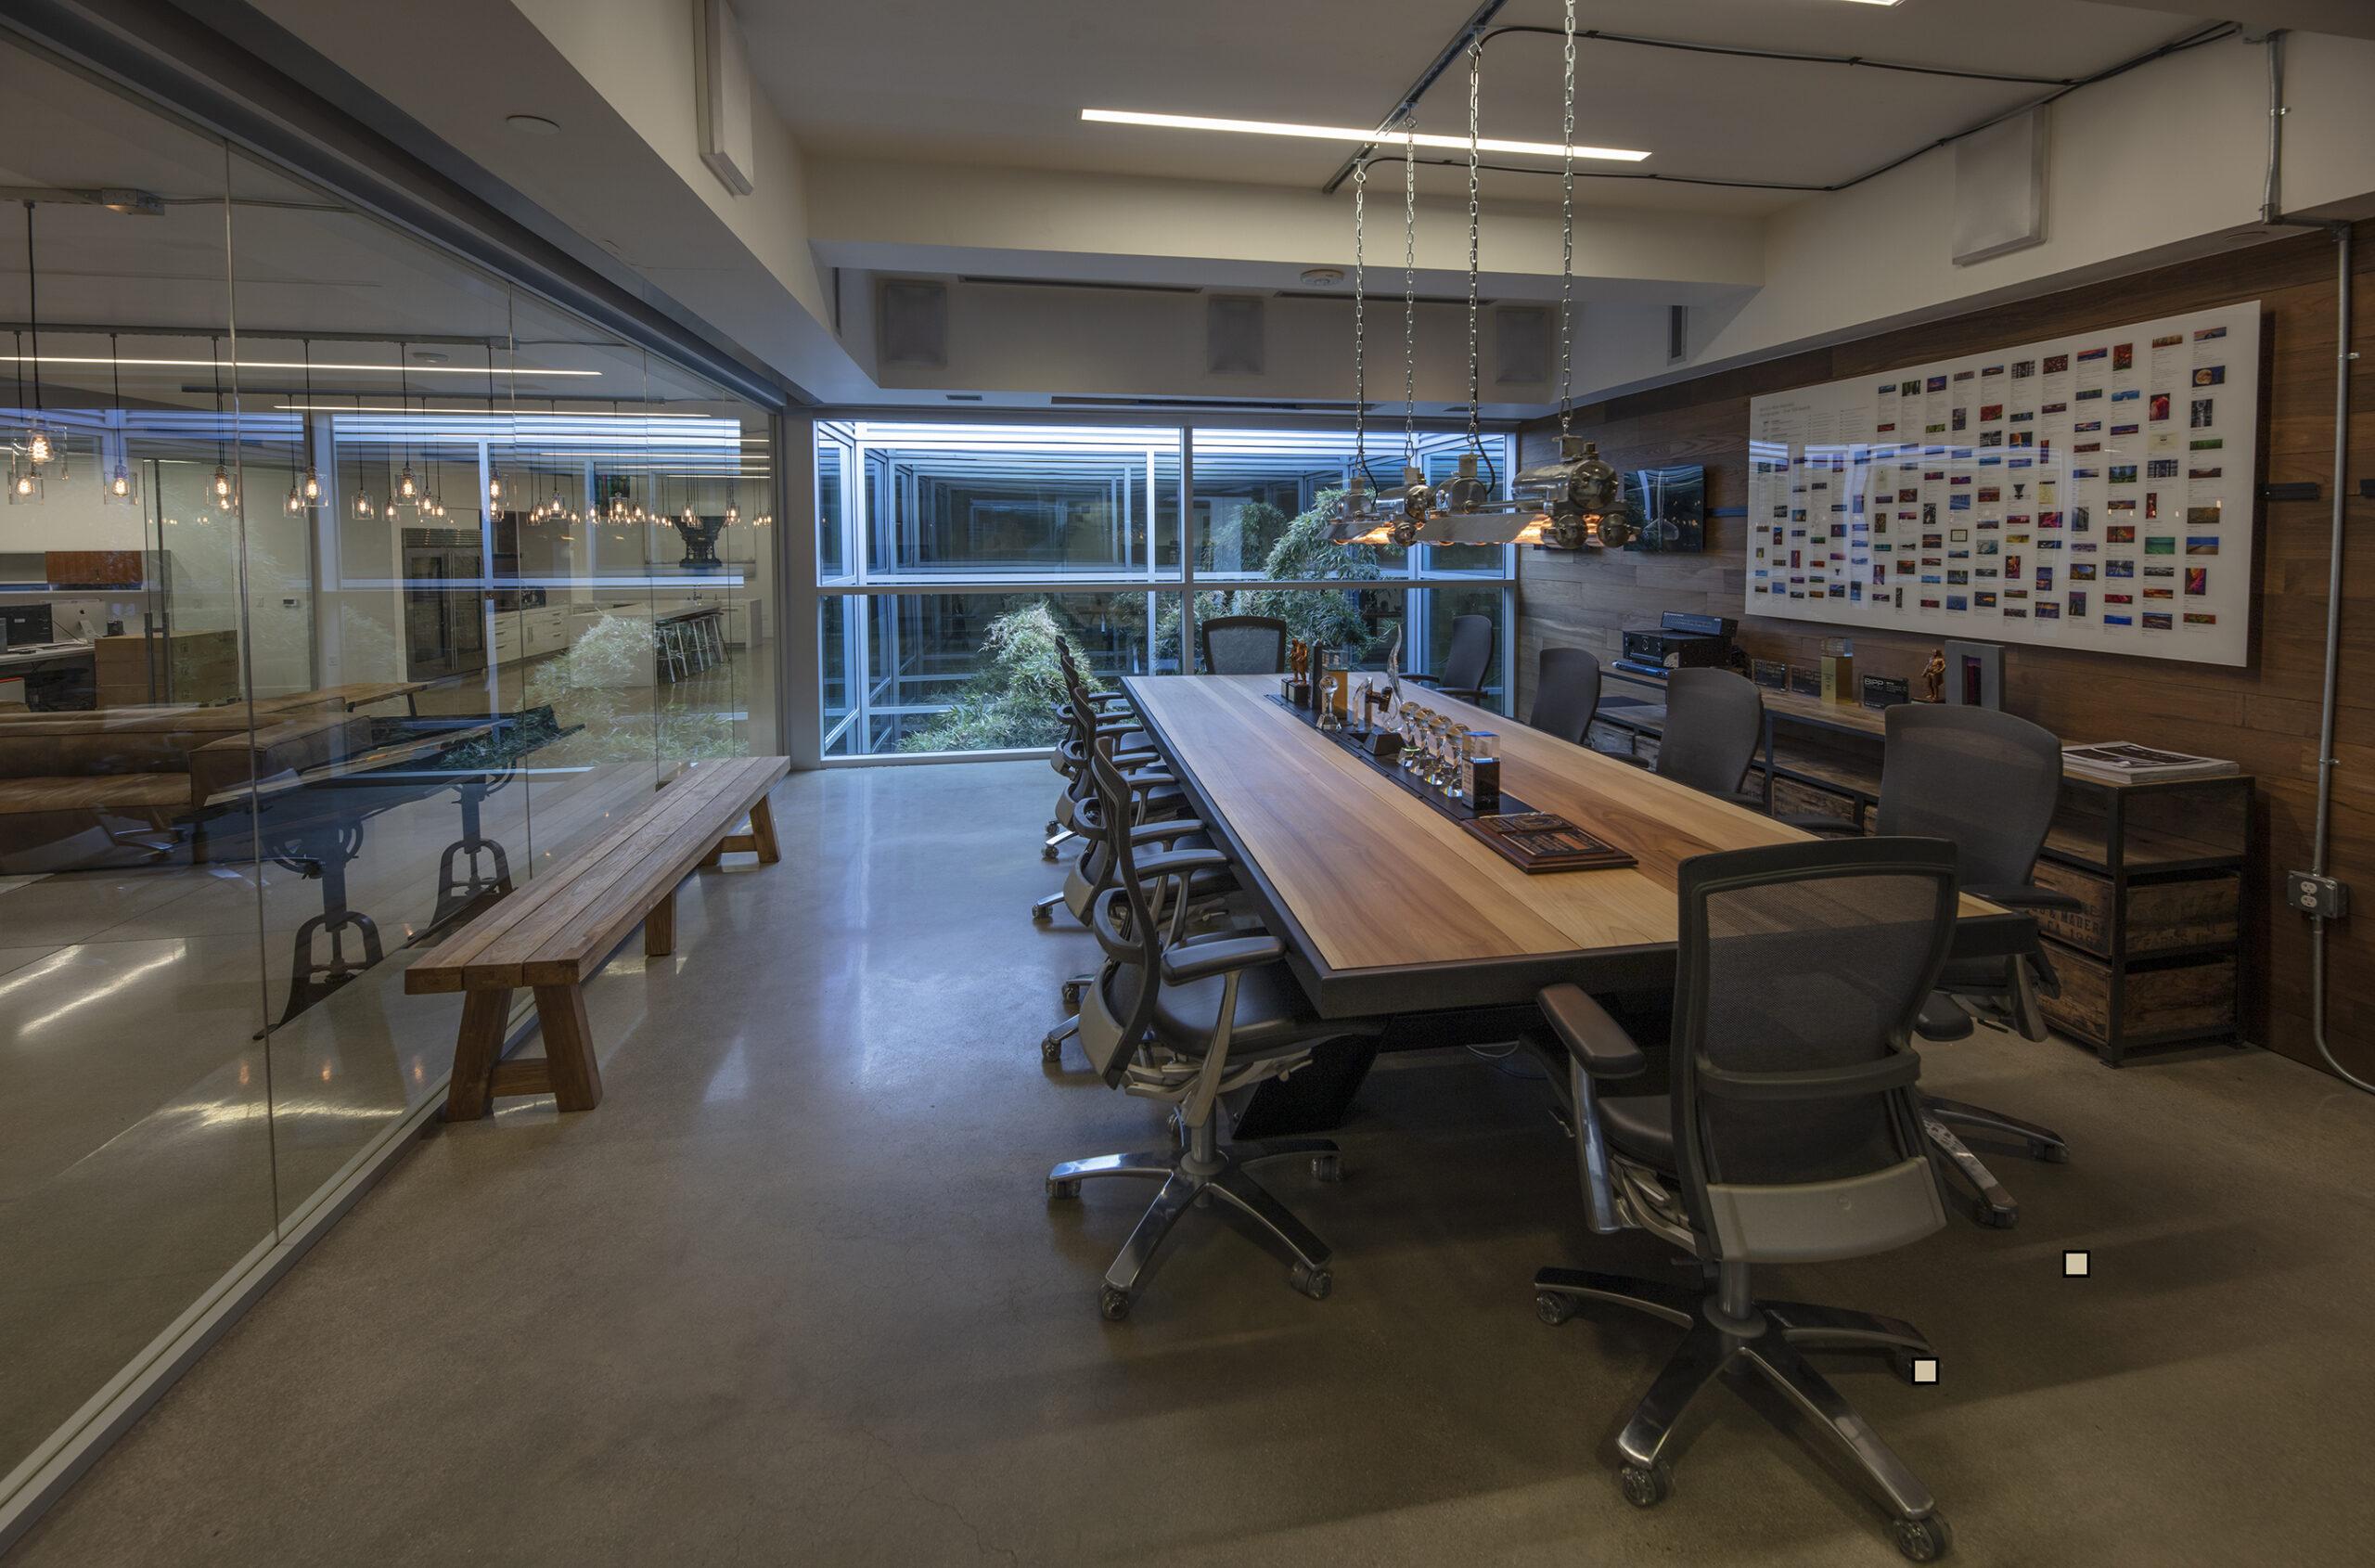 Luxury Office Warehouse Building Designed by LIK Fine Art for Sale